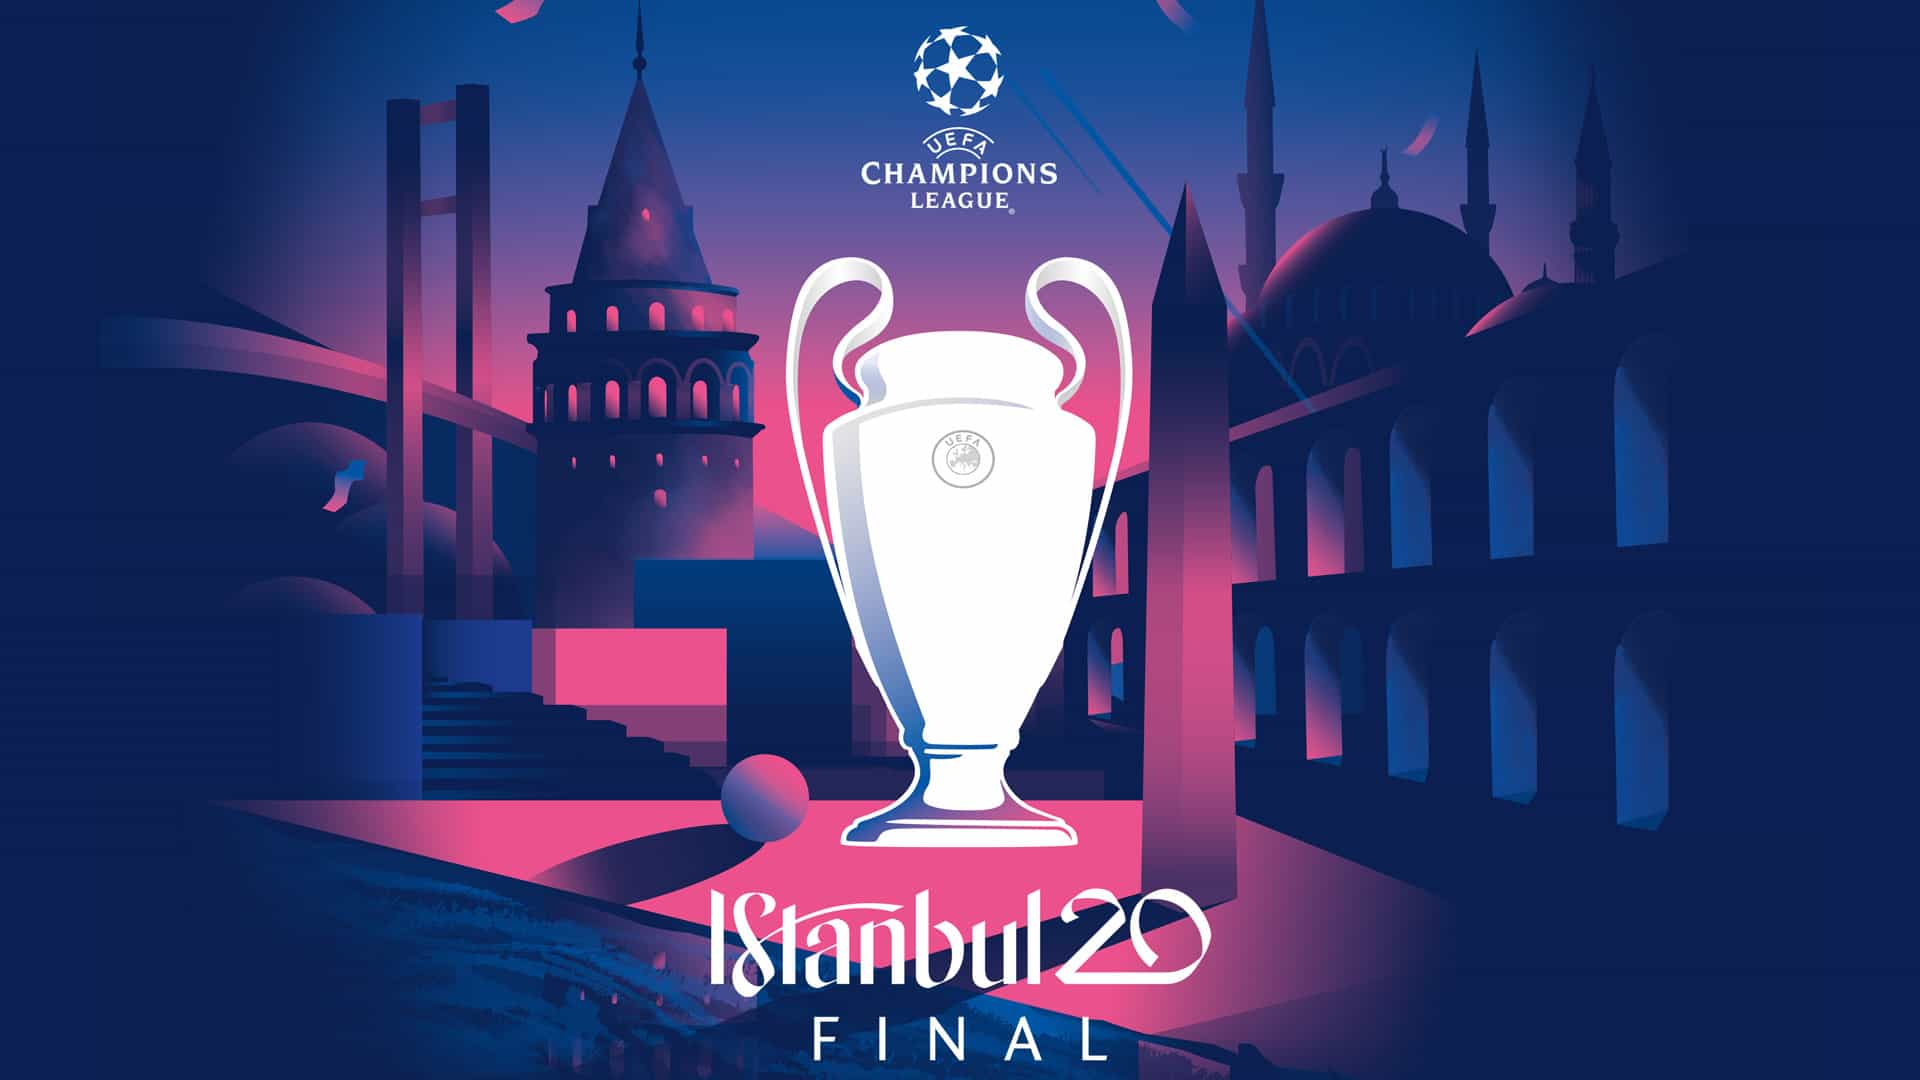 İstanbul 2020 UEFA Şampiyonlar Ligi Finali Logosu